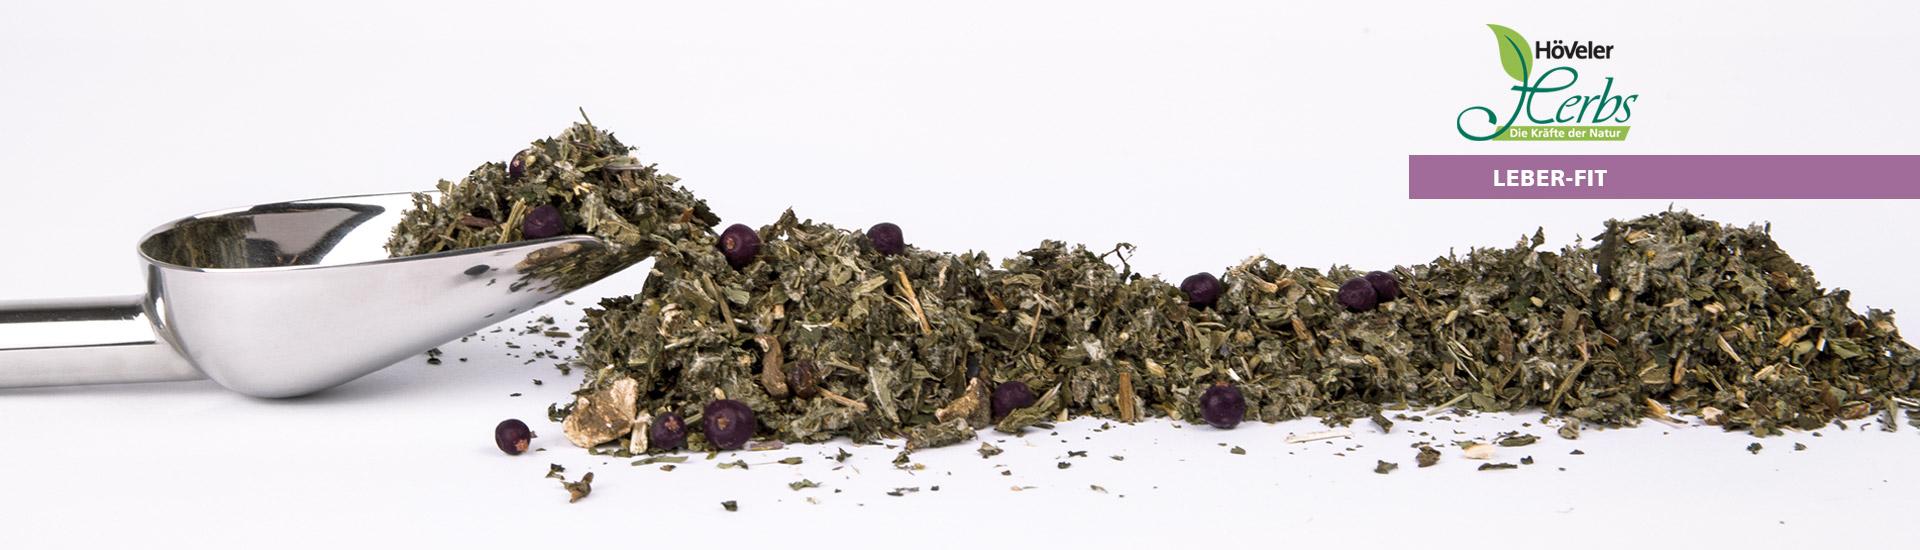 herbs-leber-fit